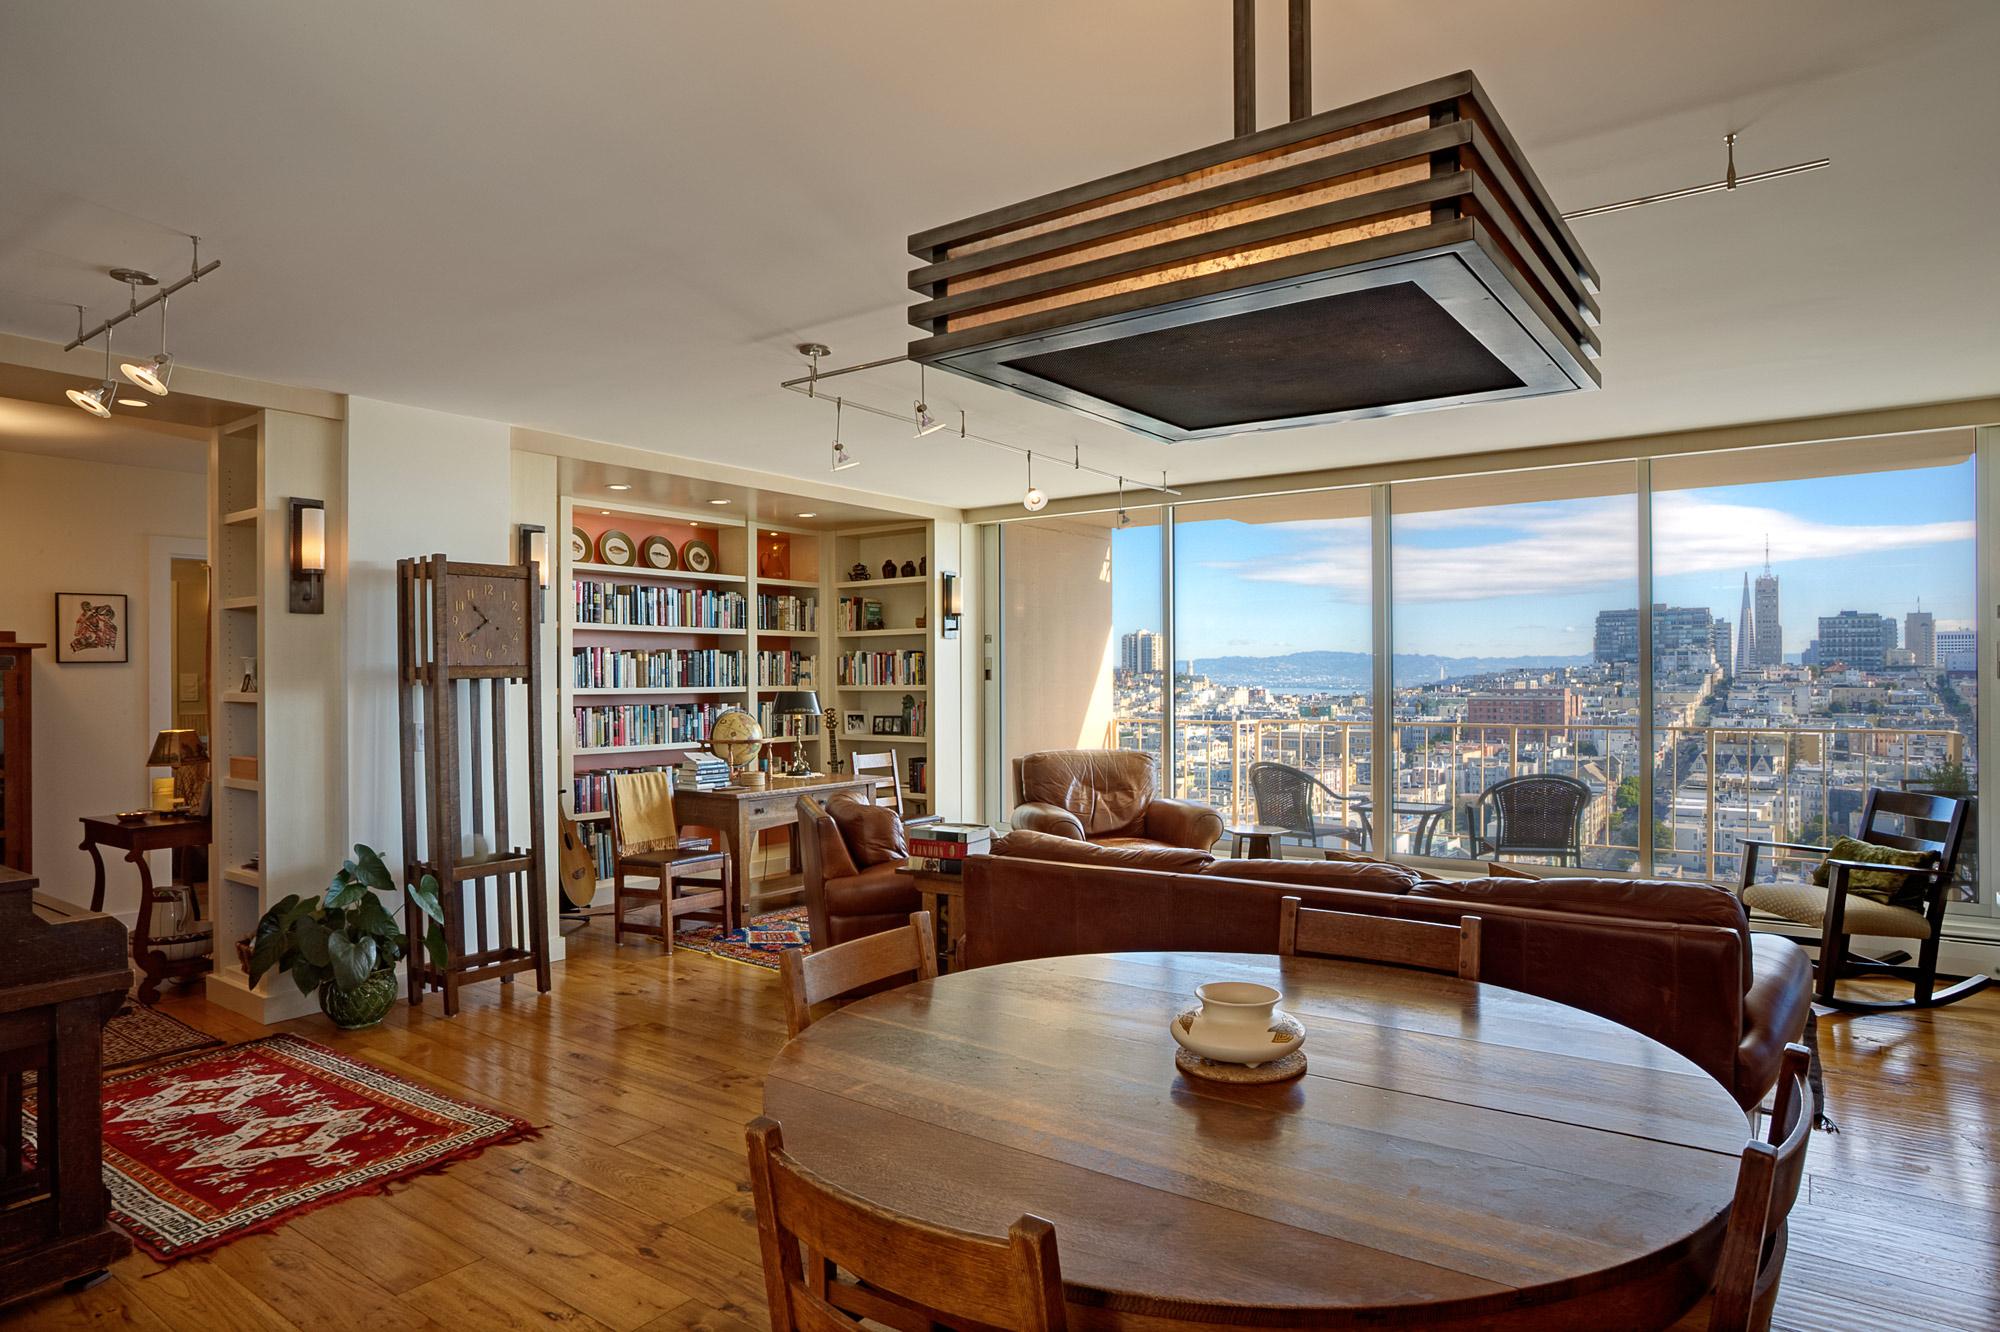 Kaplan-Architects-high-rise-interior-remodeled-living-room-1.jpg